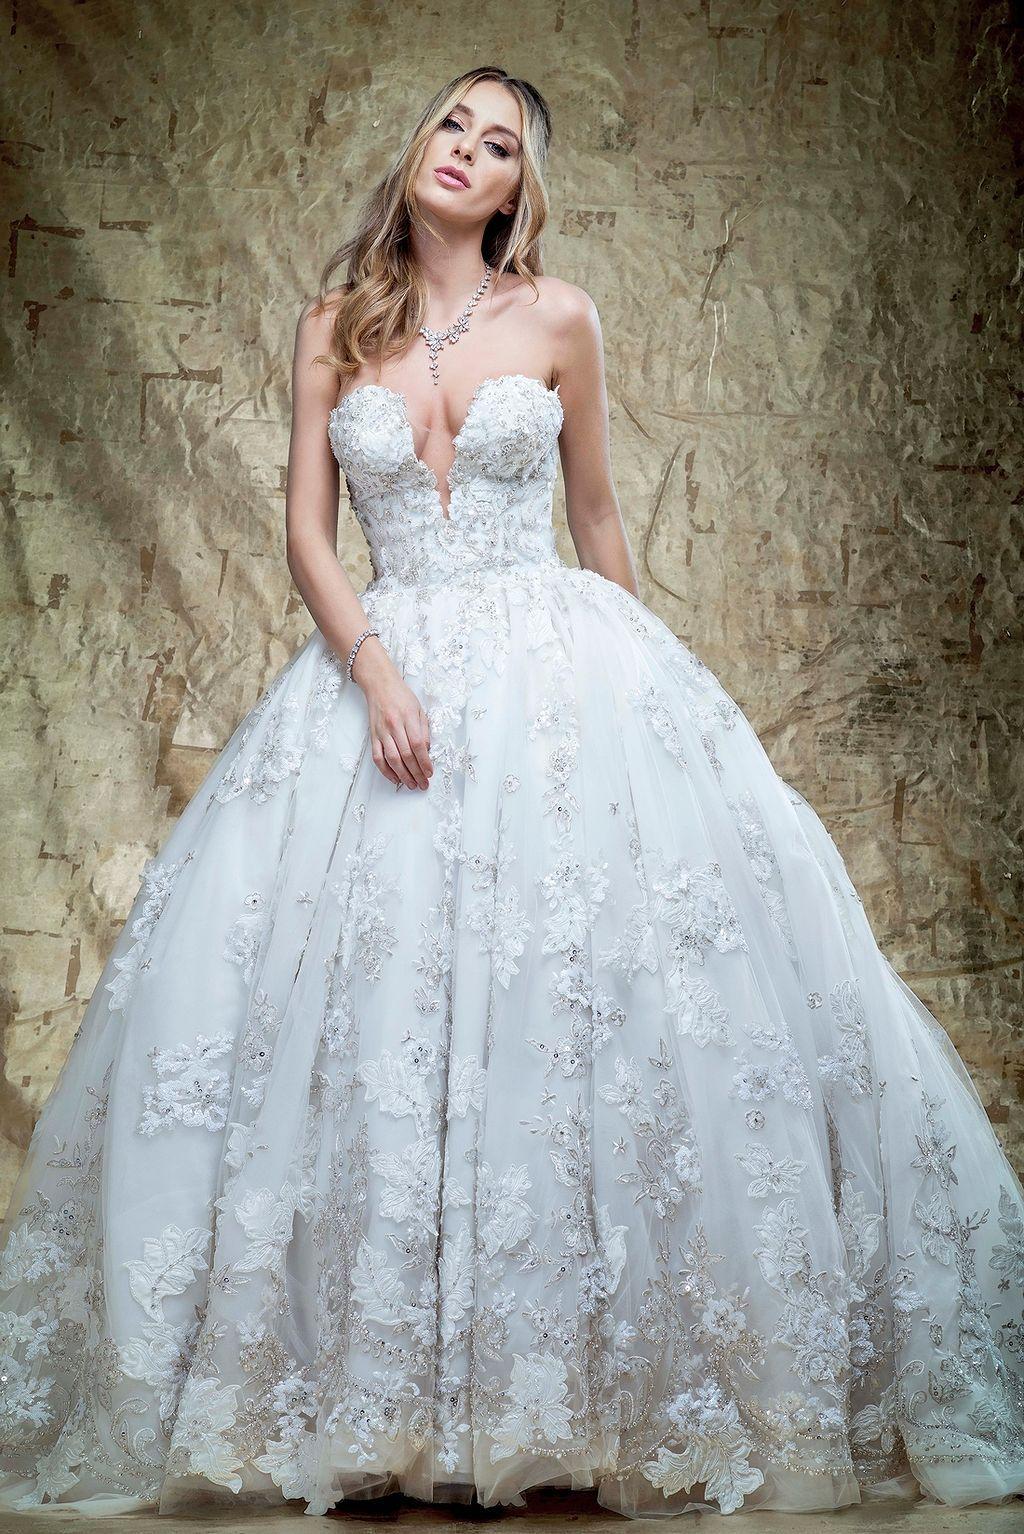 64 Princess Style Ball Gown Wedding Dress Inspiration | Princess ...